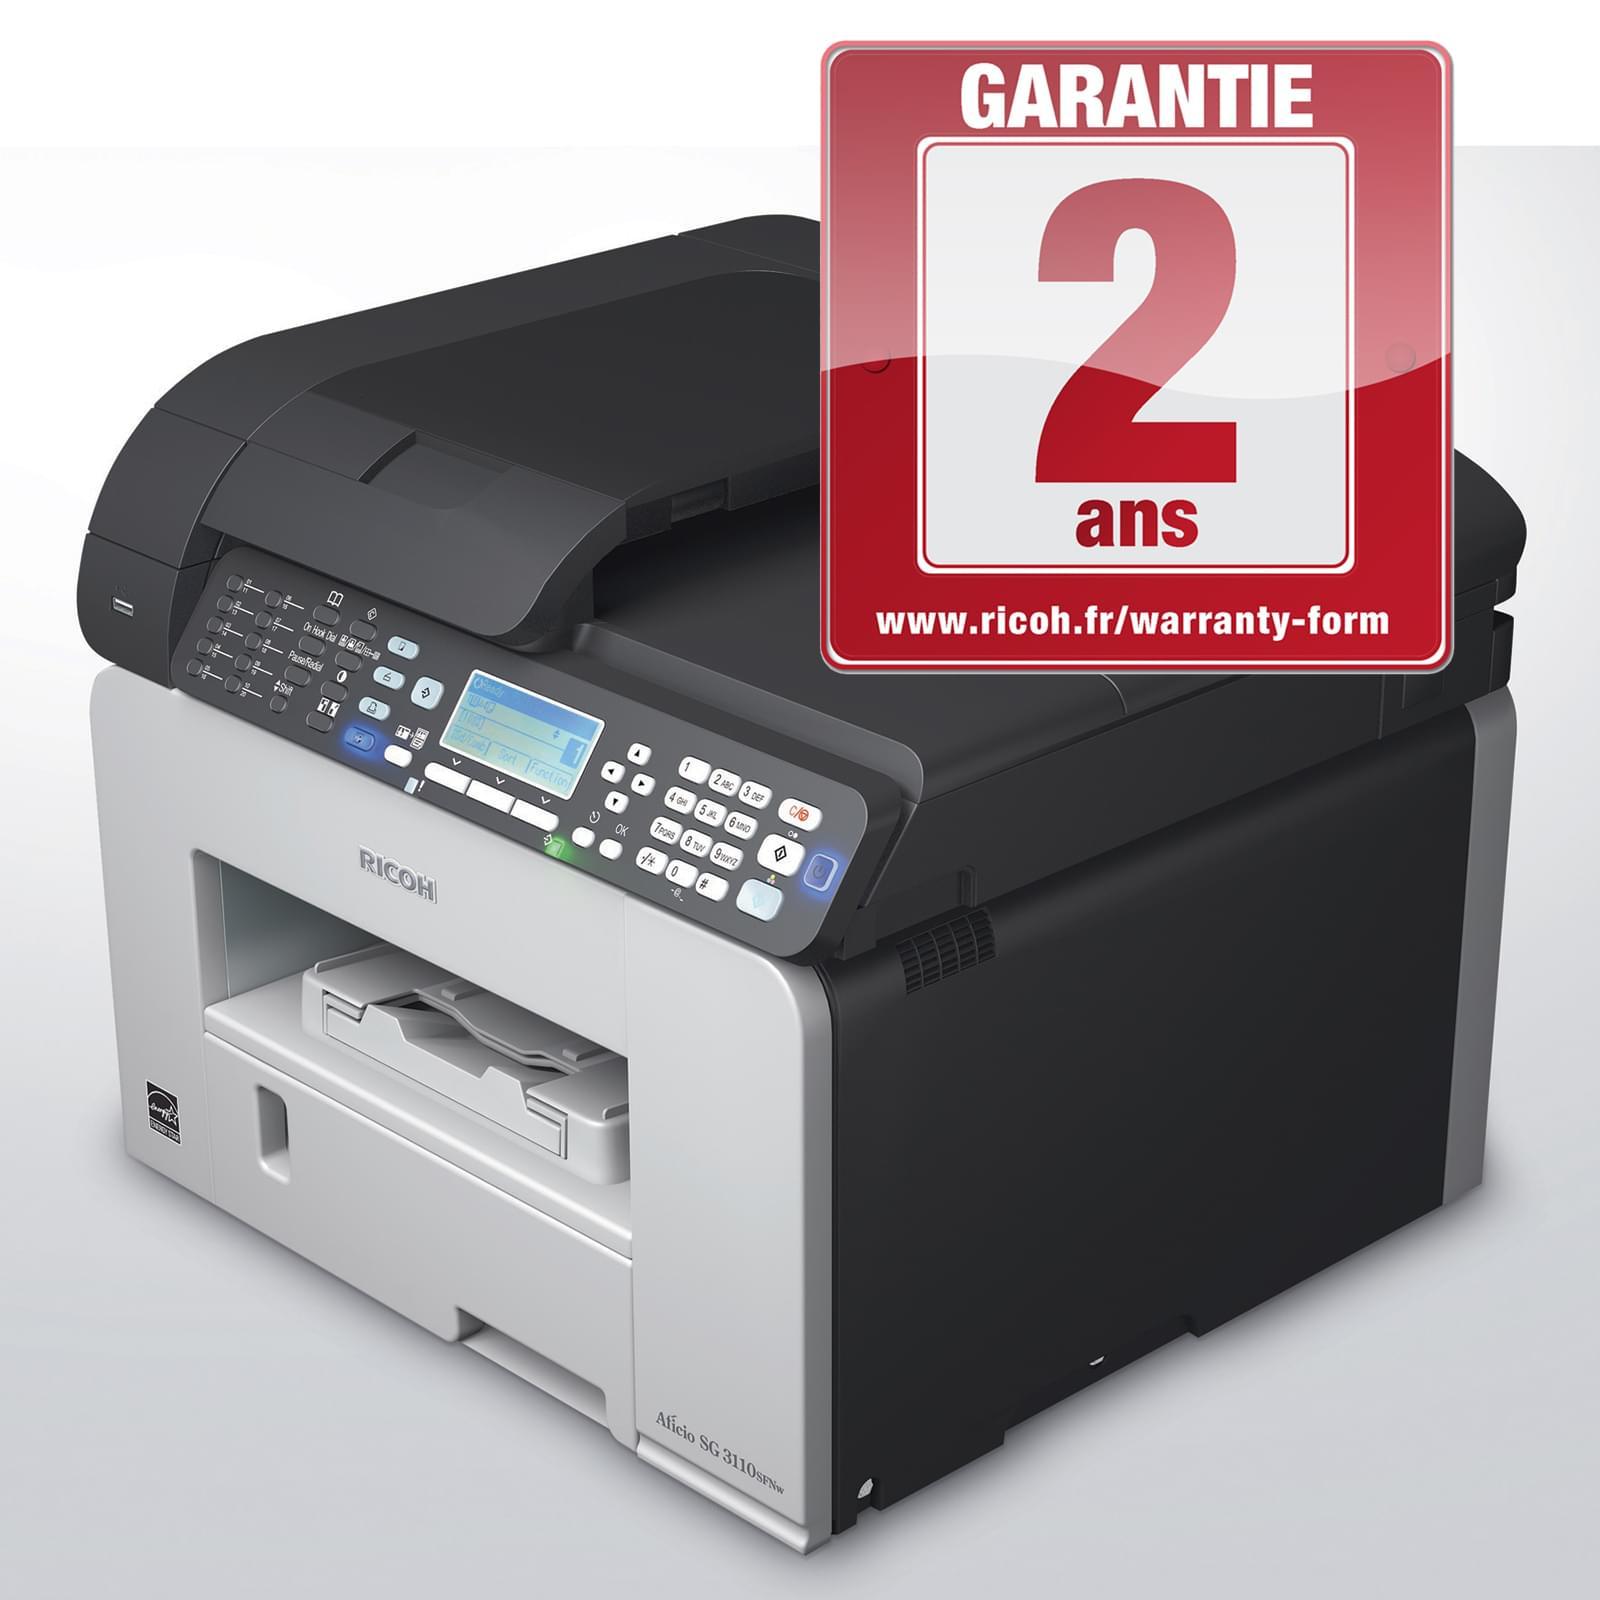 Ricoh SG 3100 SNw (GelJet/Reseau/WiFi) (981406) - Achat / Vente Imprimante multifonction sur Cybertek.fr - 0